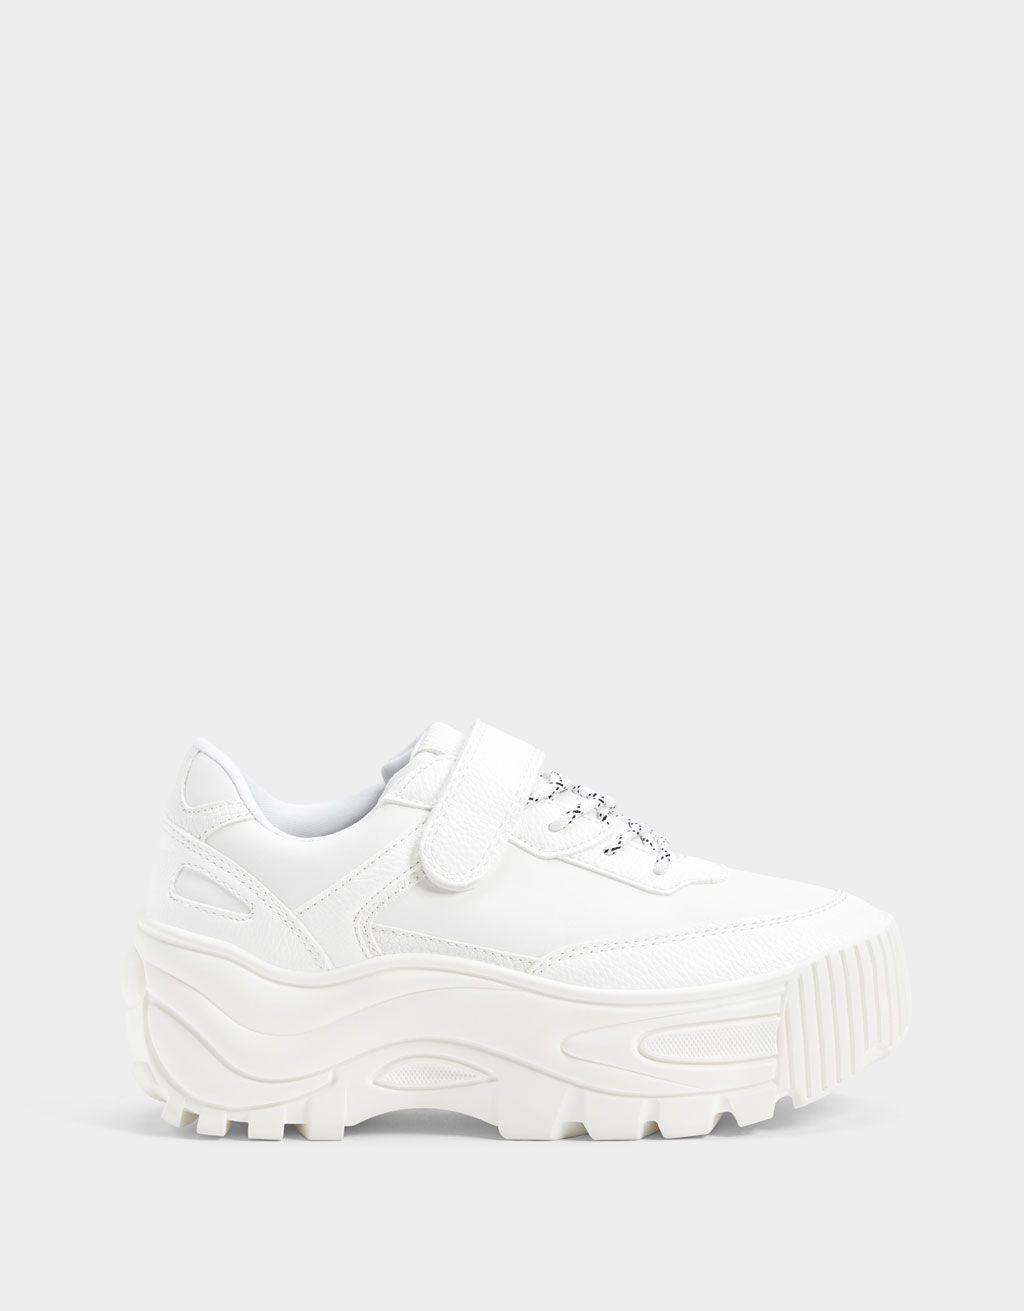 new product 54236 821d0 Monochrome platform trainers - Shoes - Bershka Israel